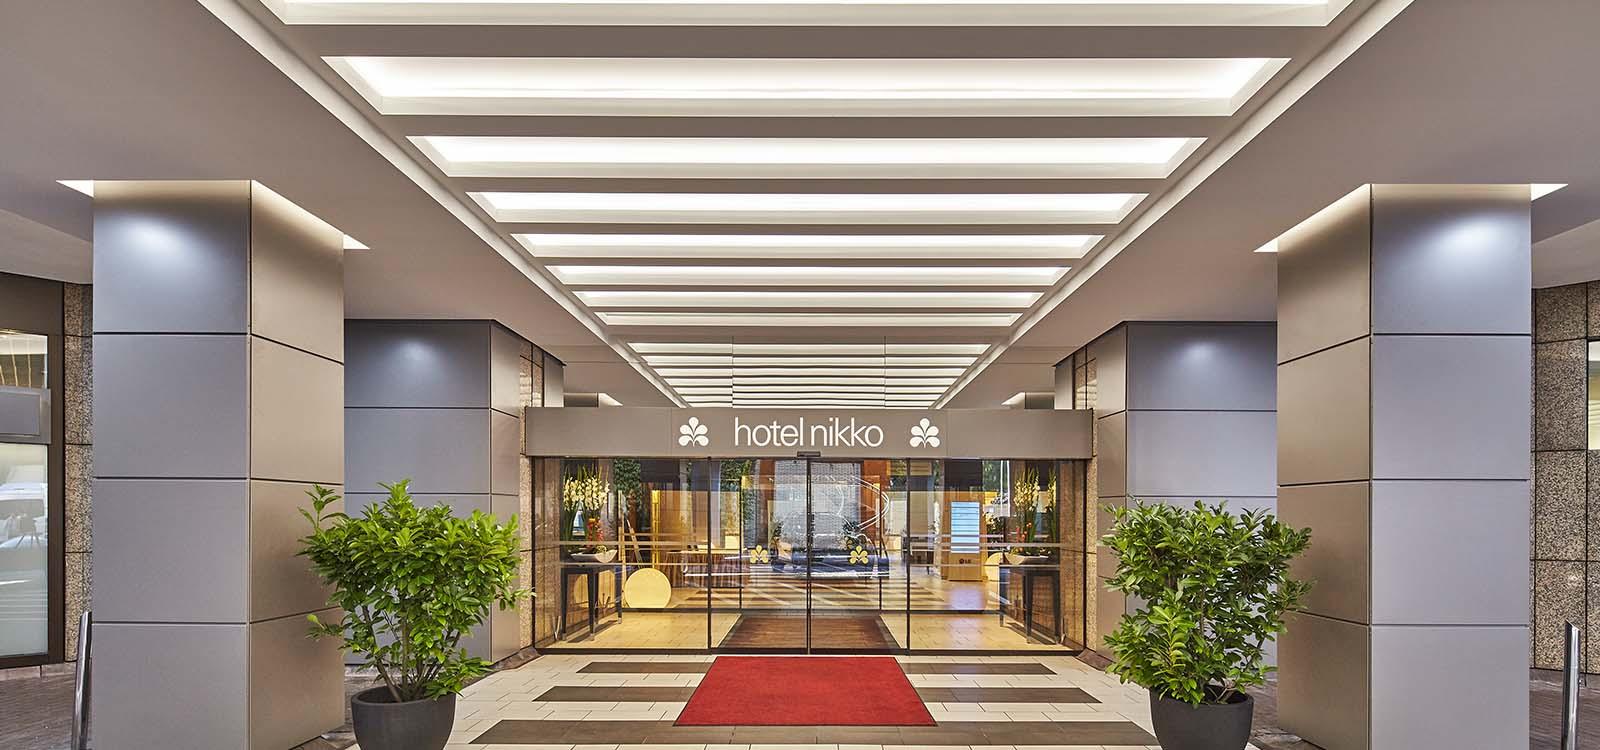 hotel nikko d sseldorf event hotels intl markenhotellerie in deutschland europa. Black Bedroom Furniture Sets. Home Design Ideas